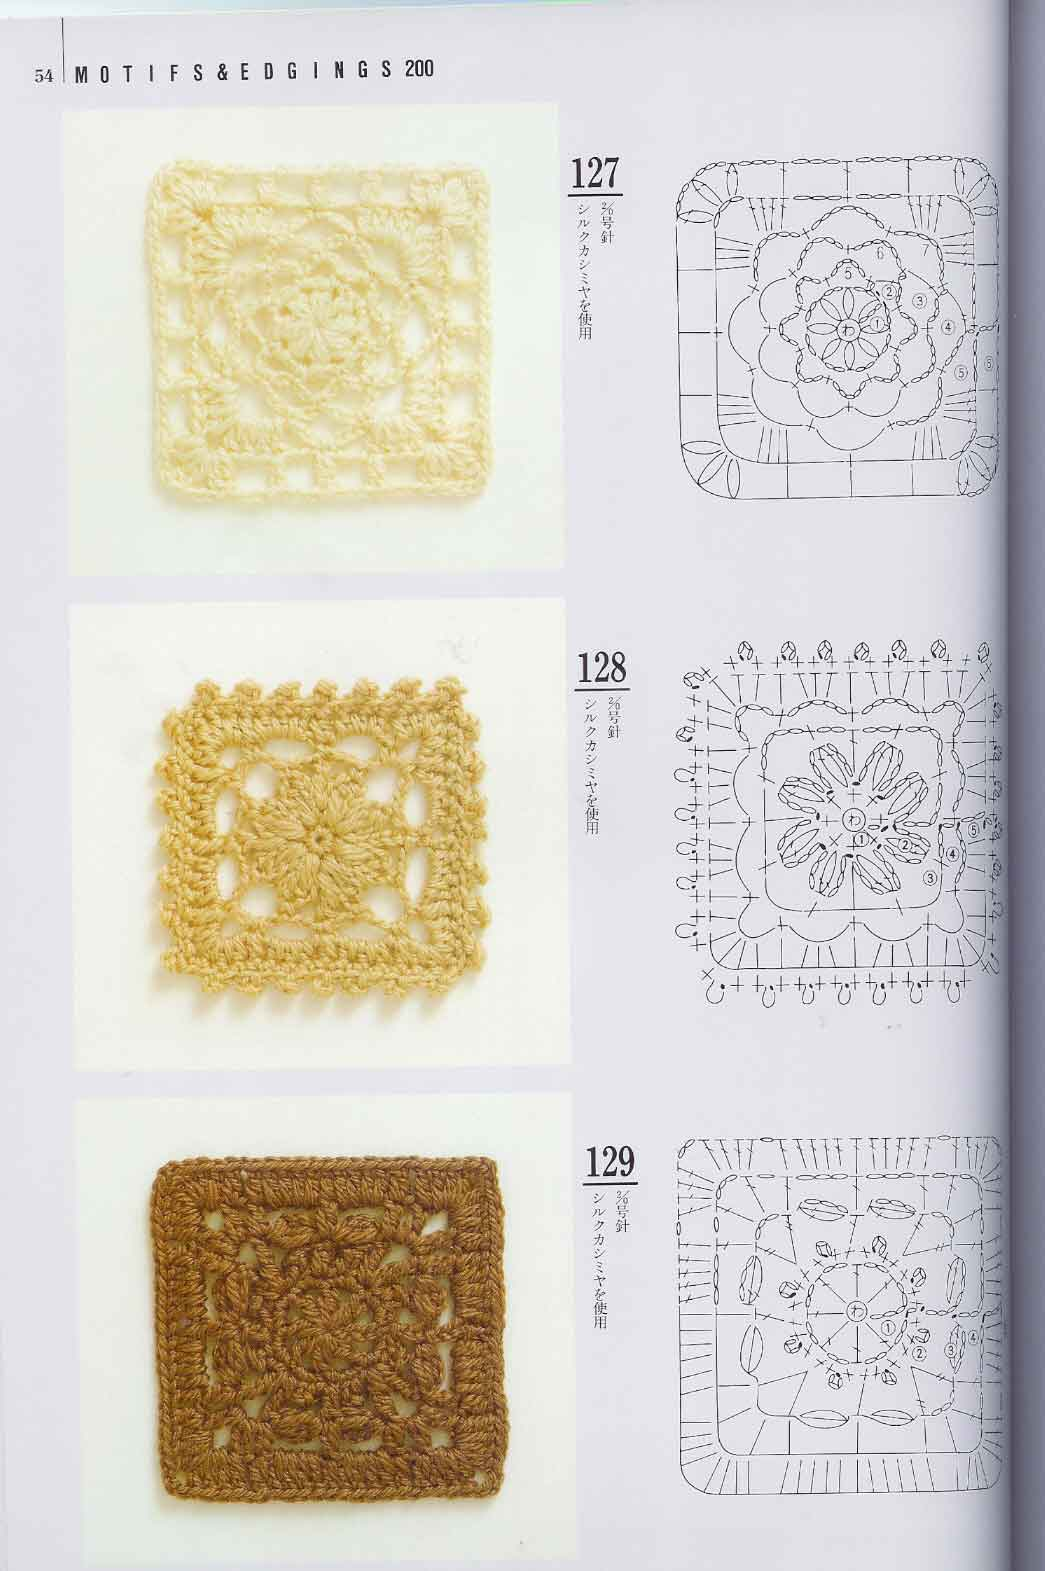 Piastrelle uncinetto 38 punto croce uncinetto schemi gratis hobby creativi - Schemi piastrelle uncinetto ...